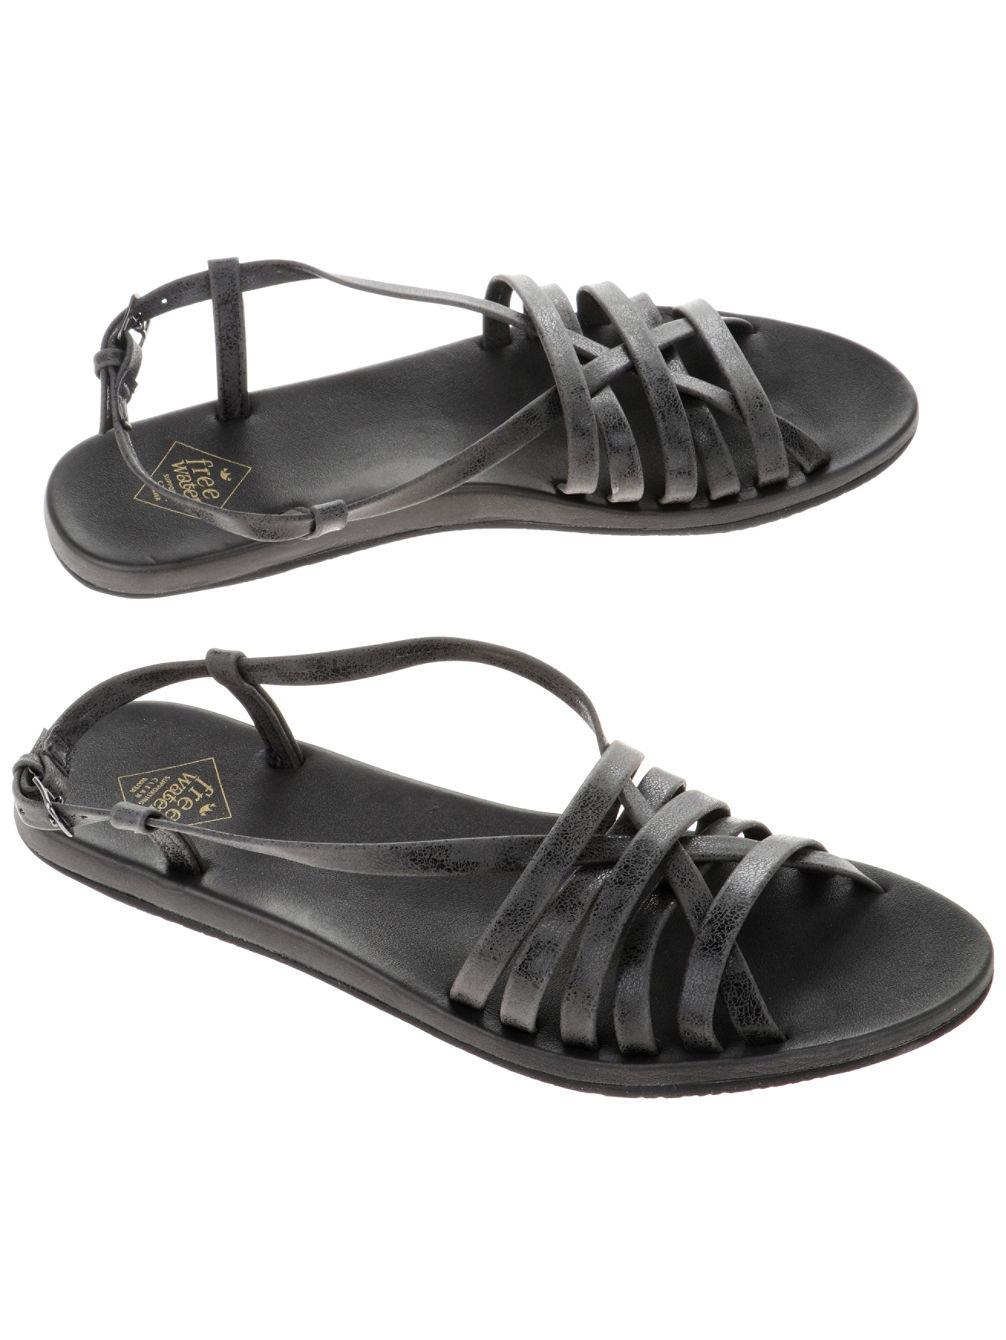 freewaters-hurachay-sandals-women